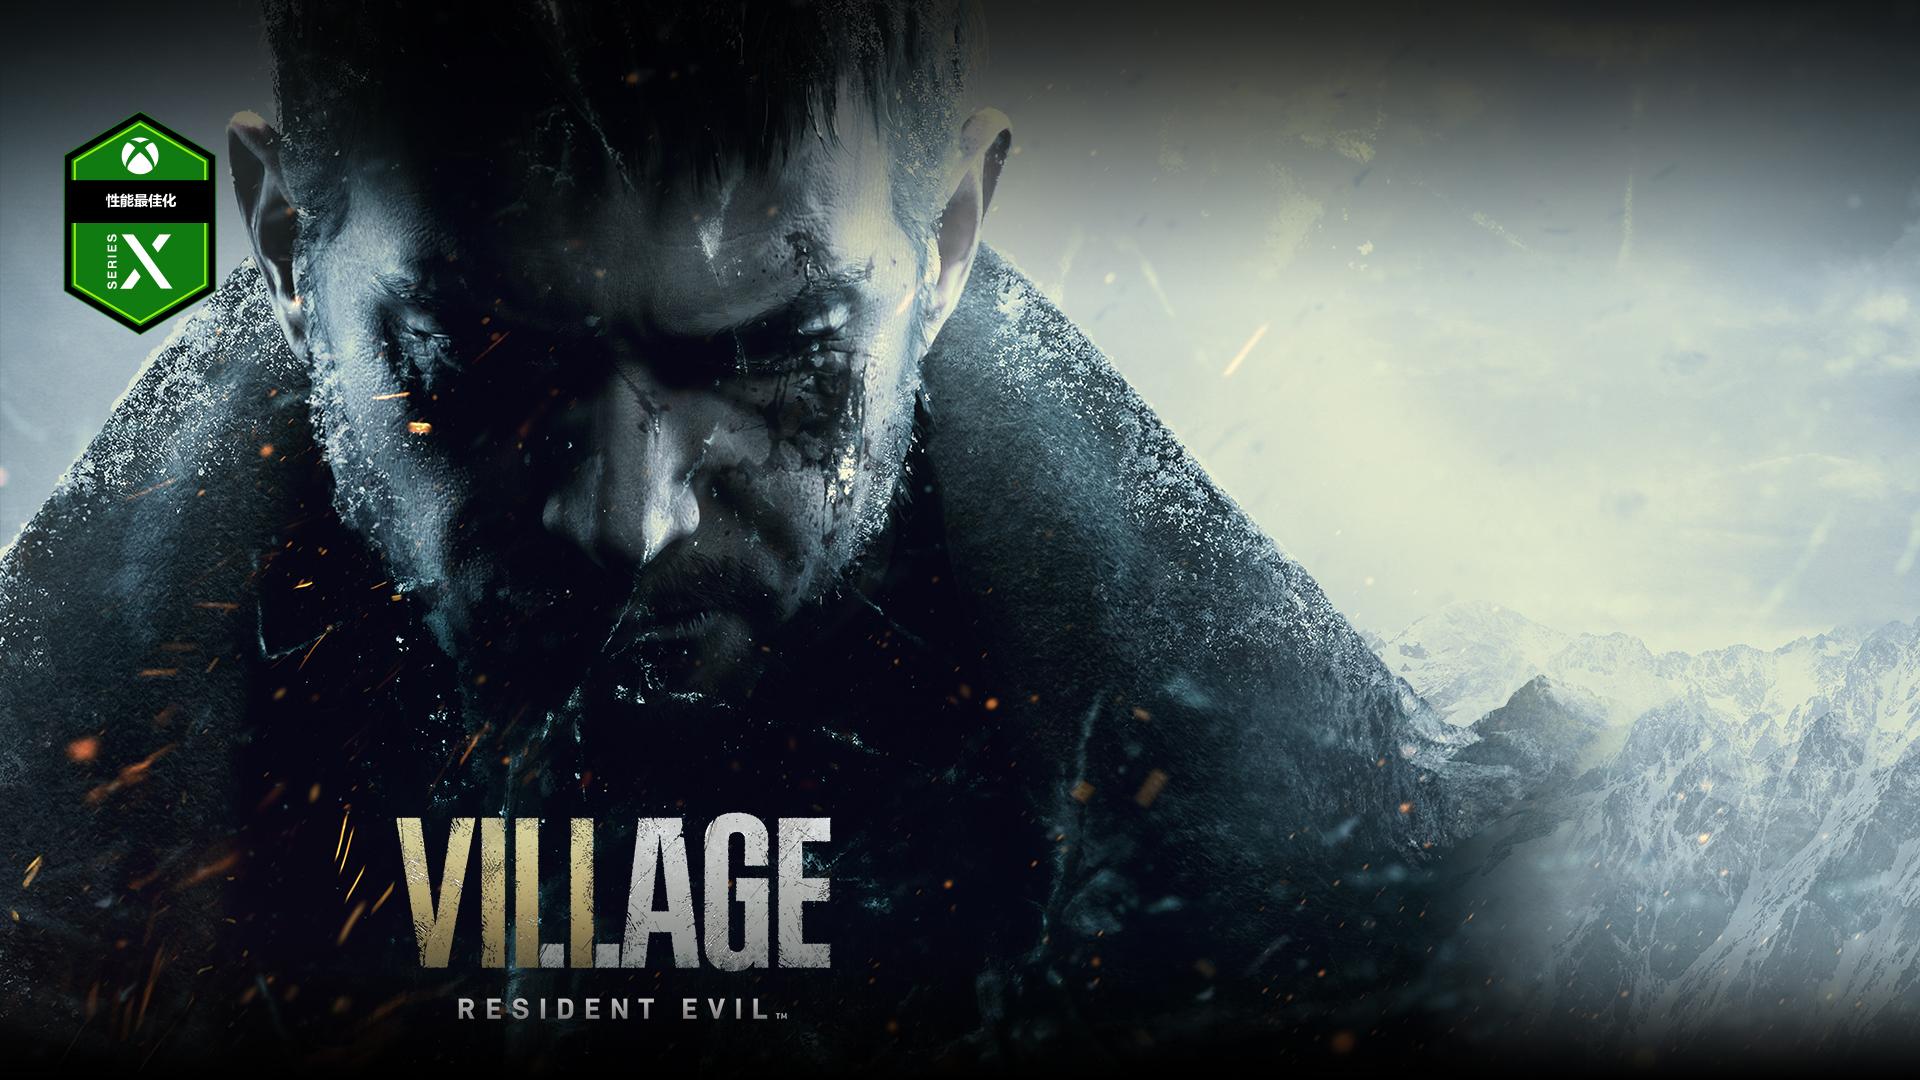 Resident Evil Village,Chris Redfield 陰沉的臉孔在山脈側邊